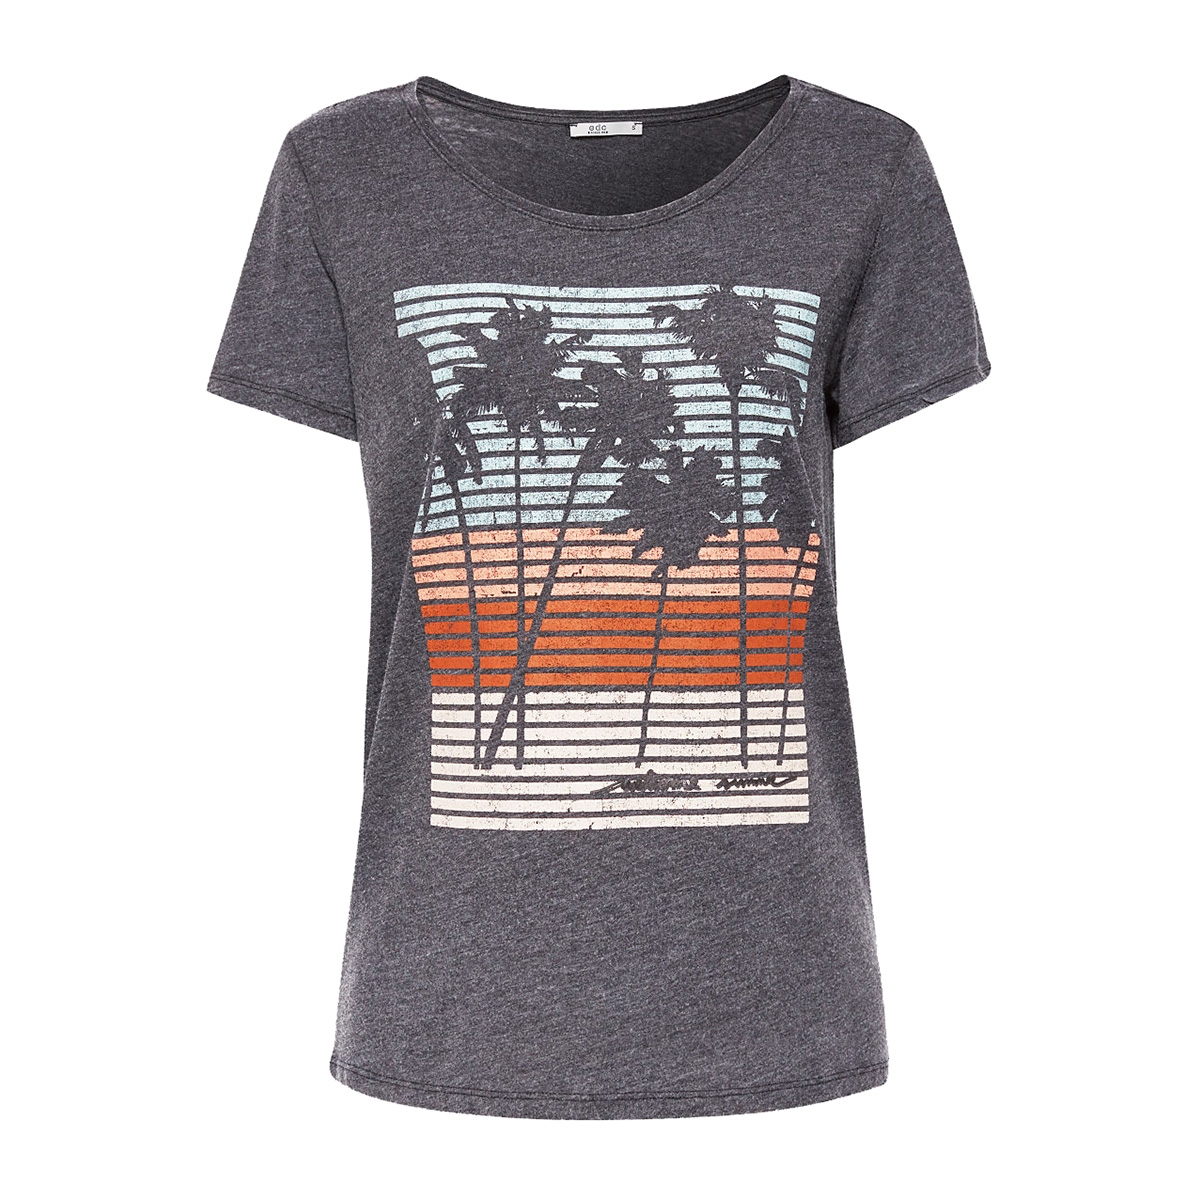 burn out shirt met artwork print 079cc1k020 edc t-shirt c001